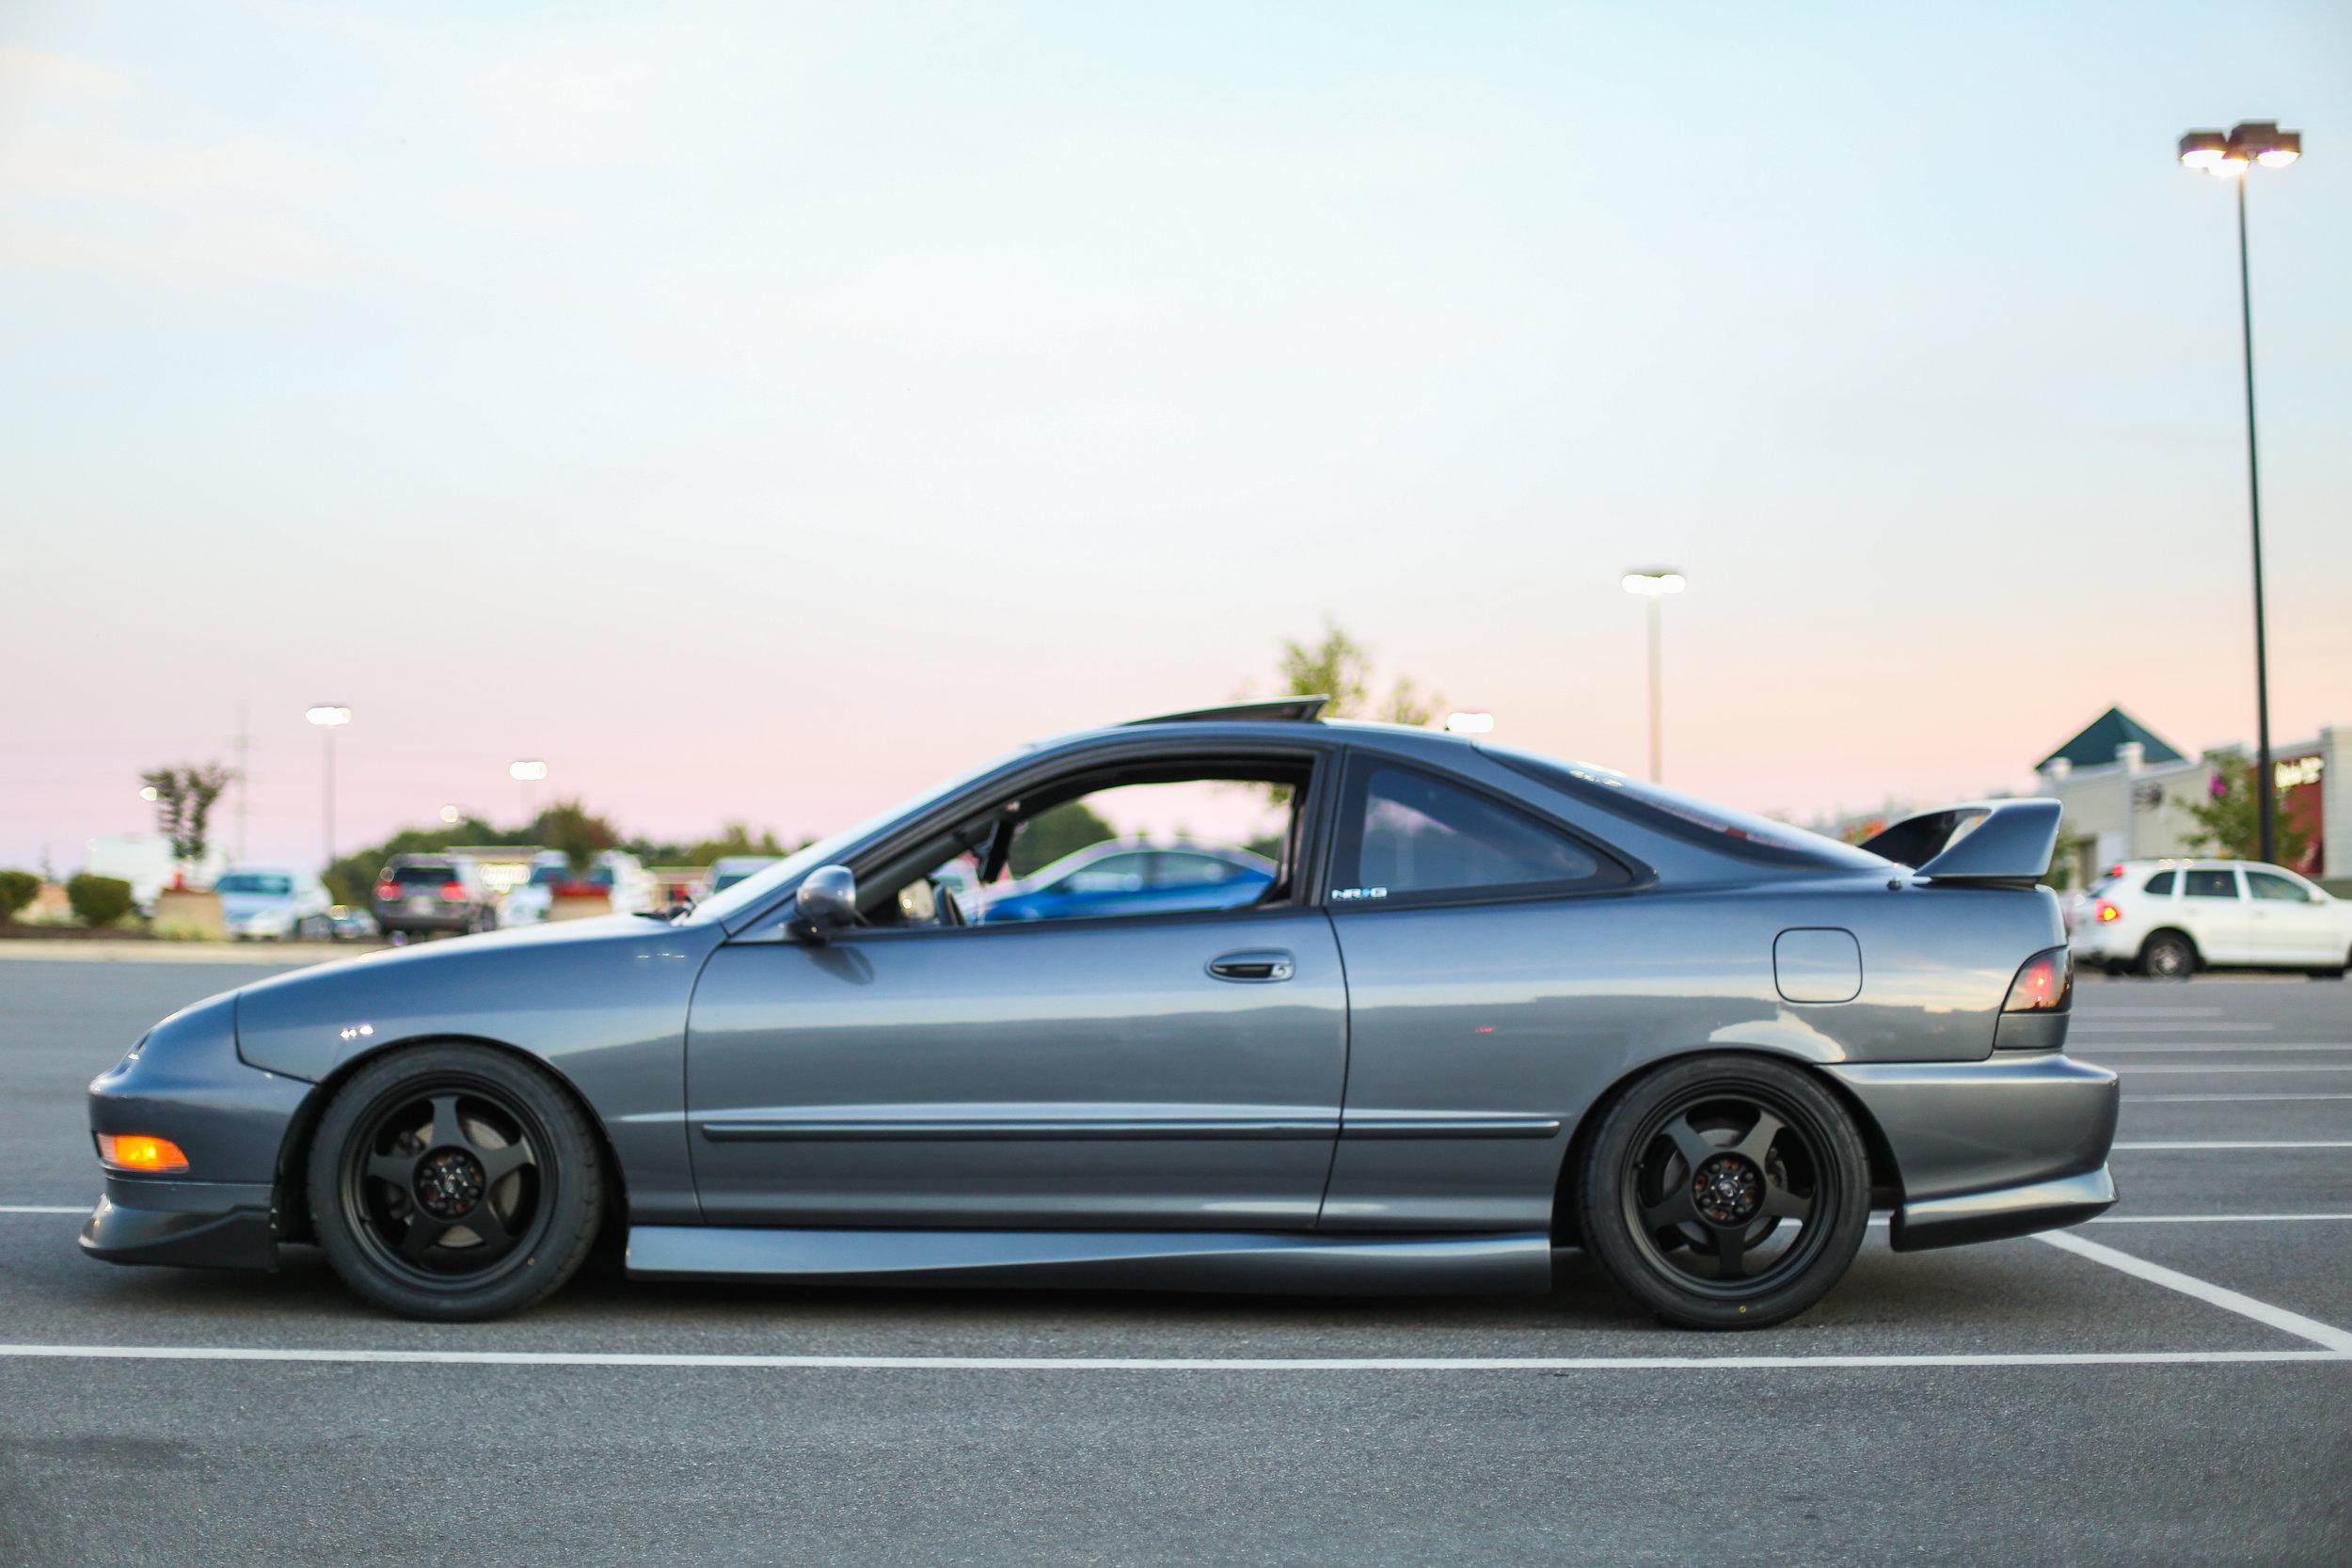 My 1994 Acura Integra LS